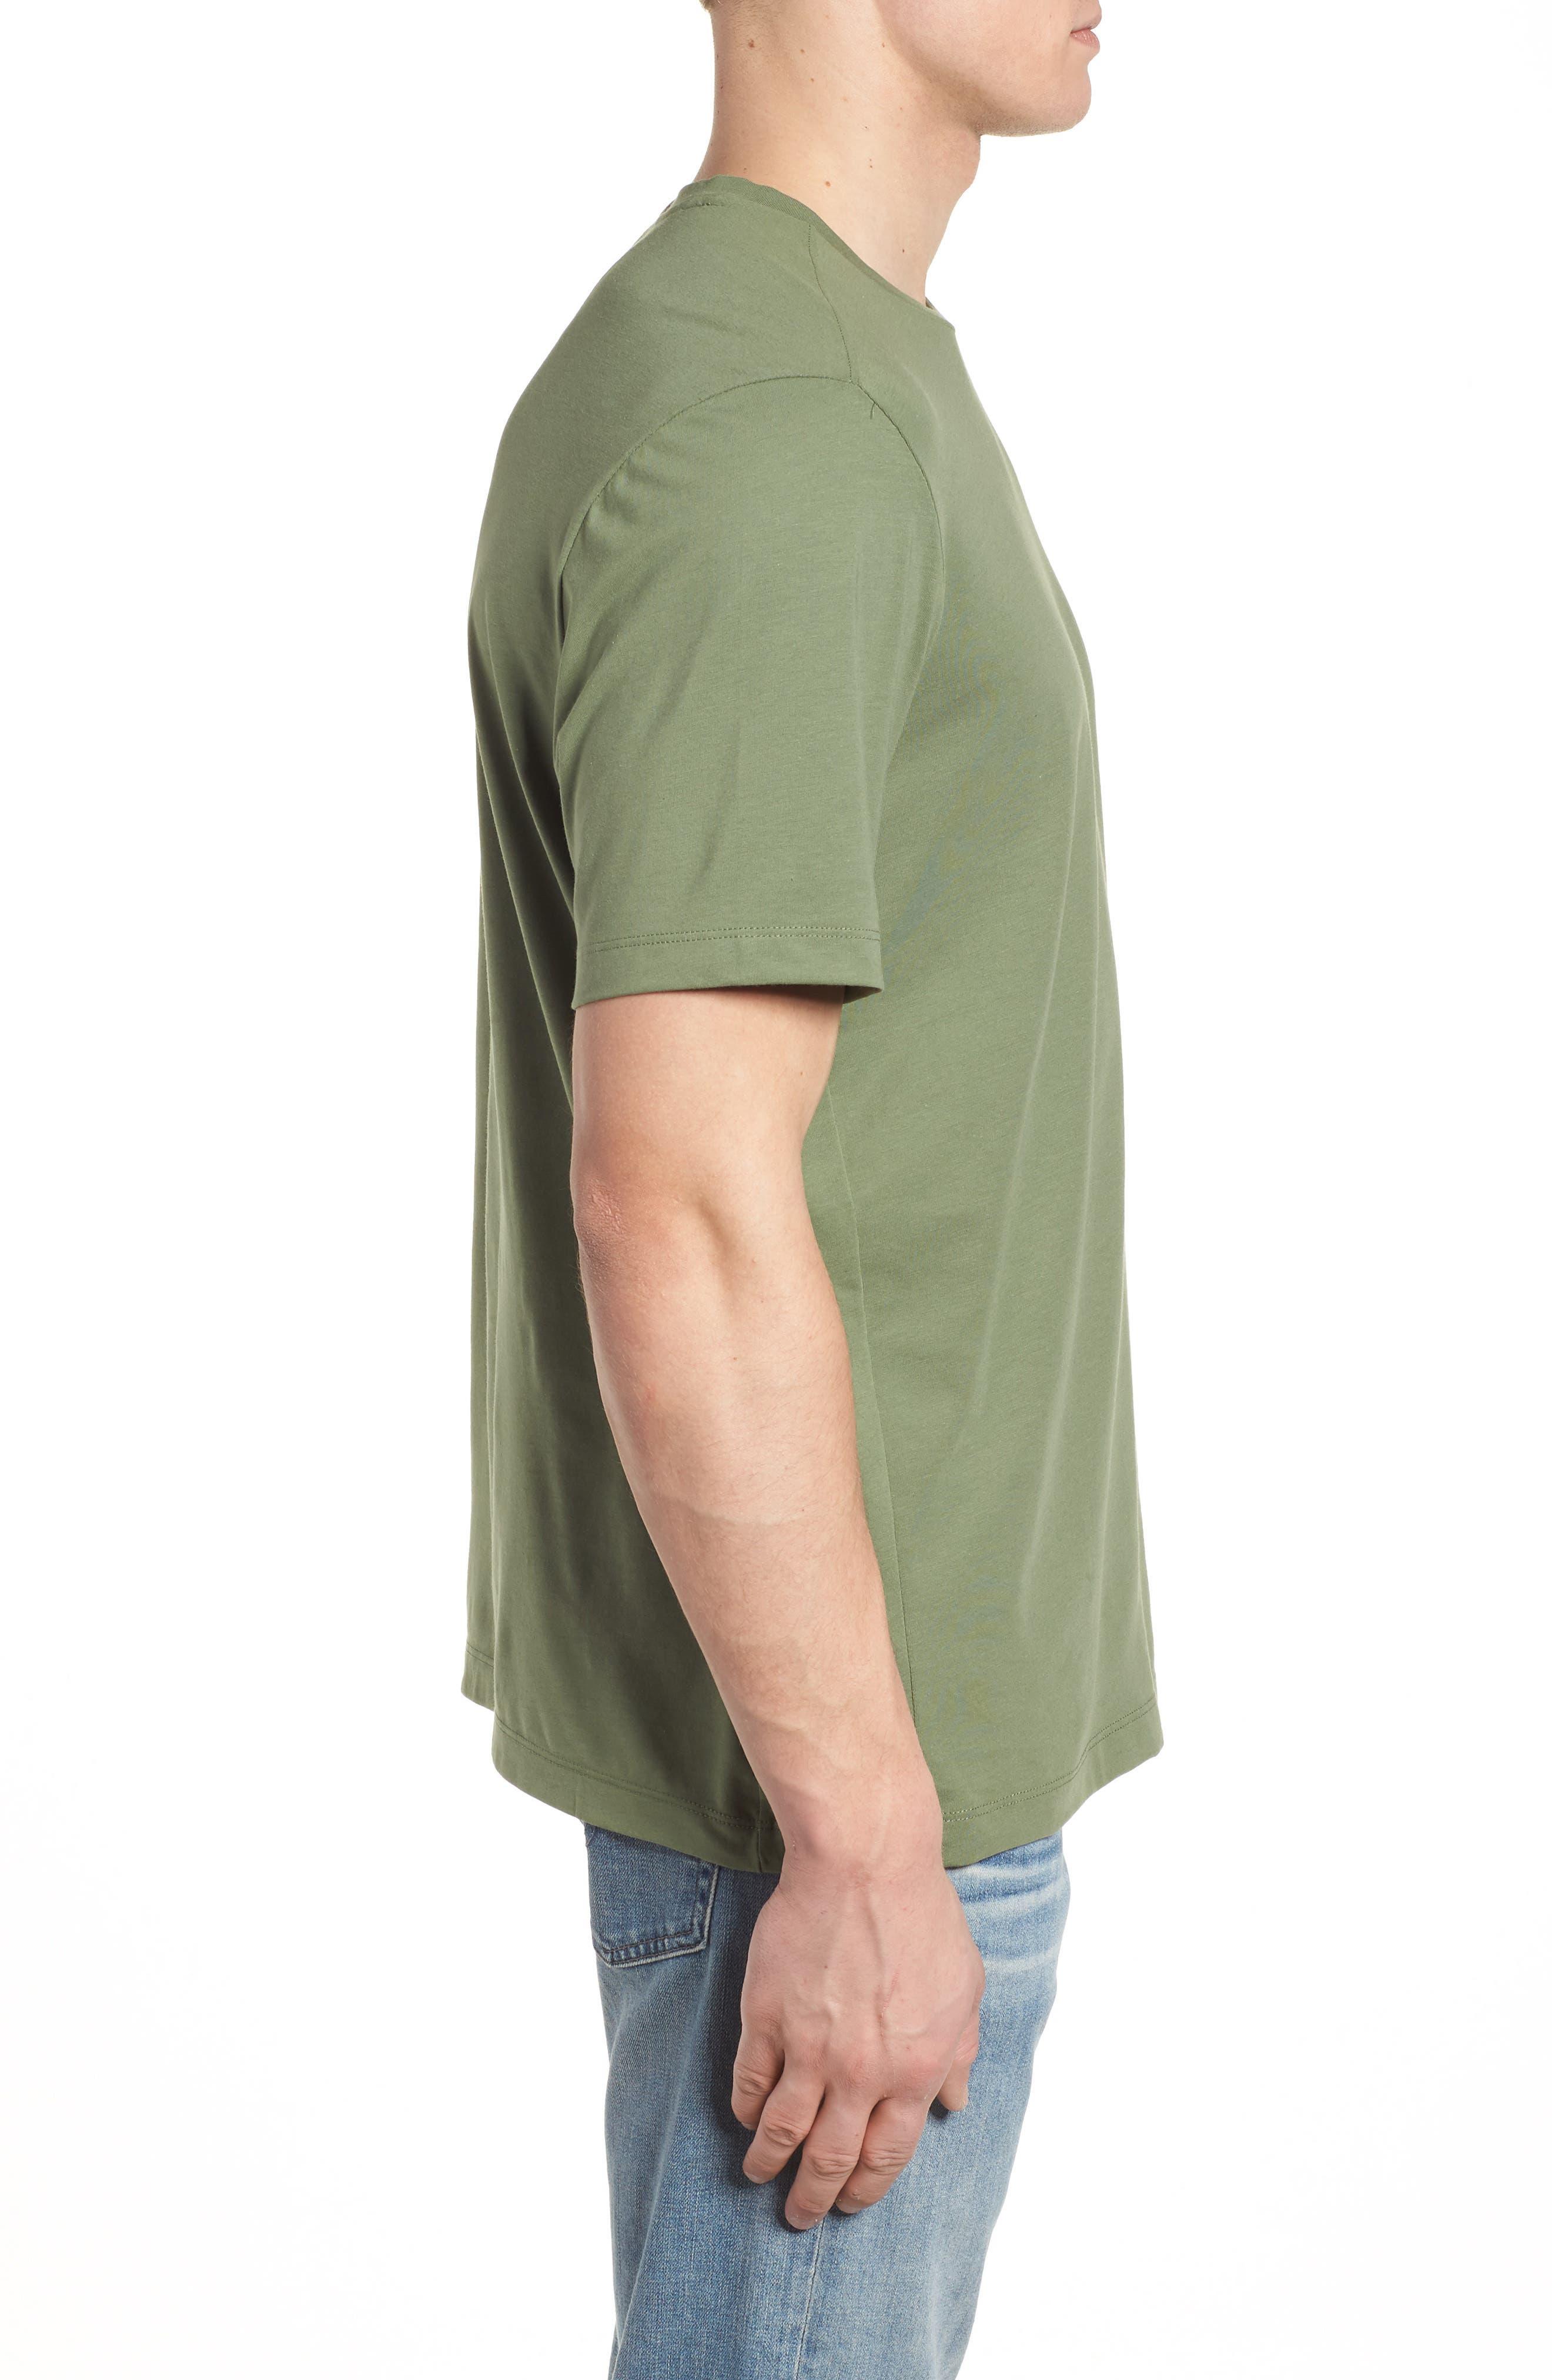 Tropicool T-Shirt,                             Alternate thumbnail 23, color,